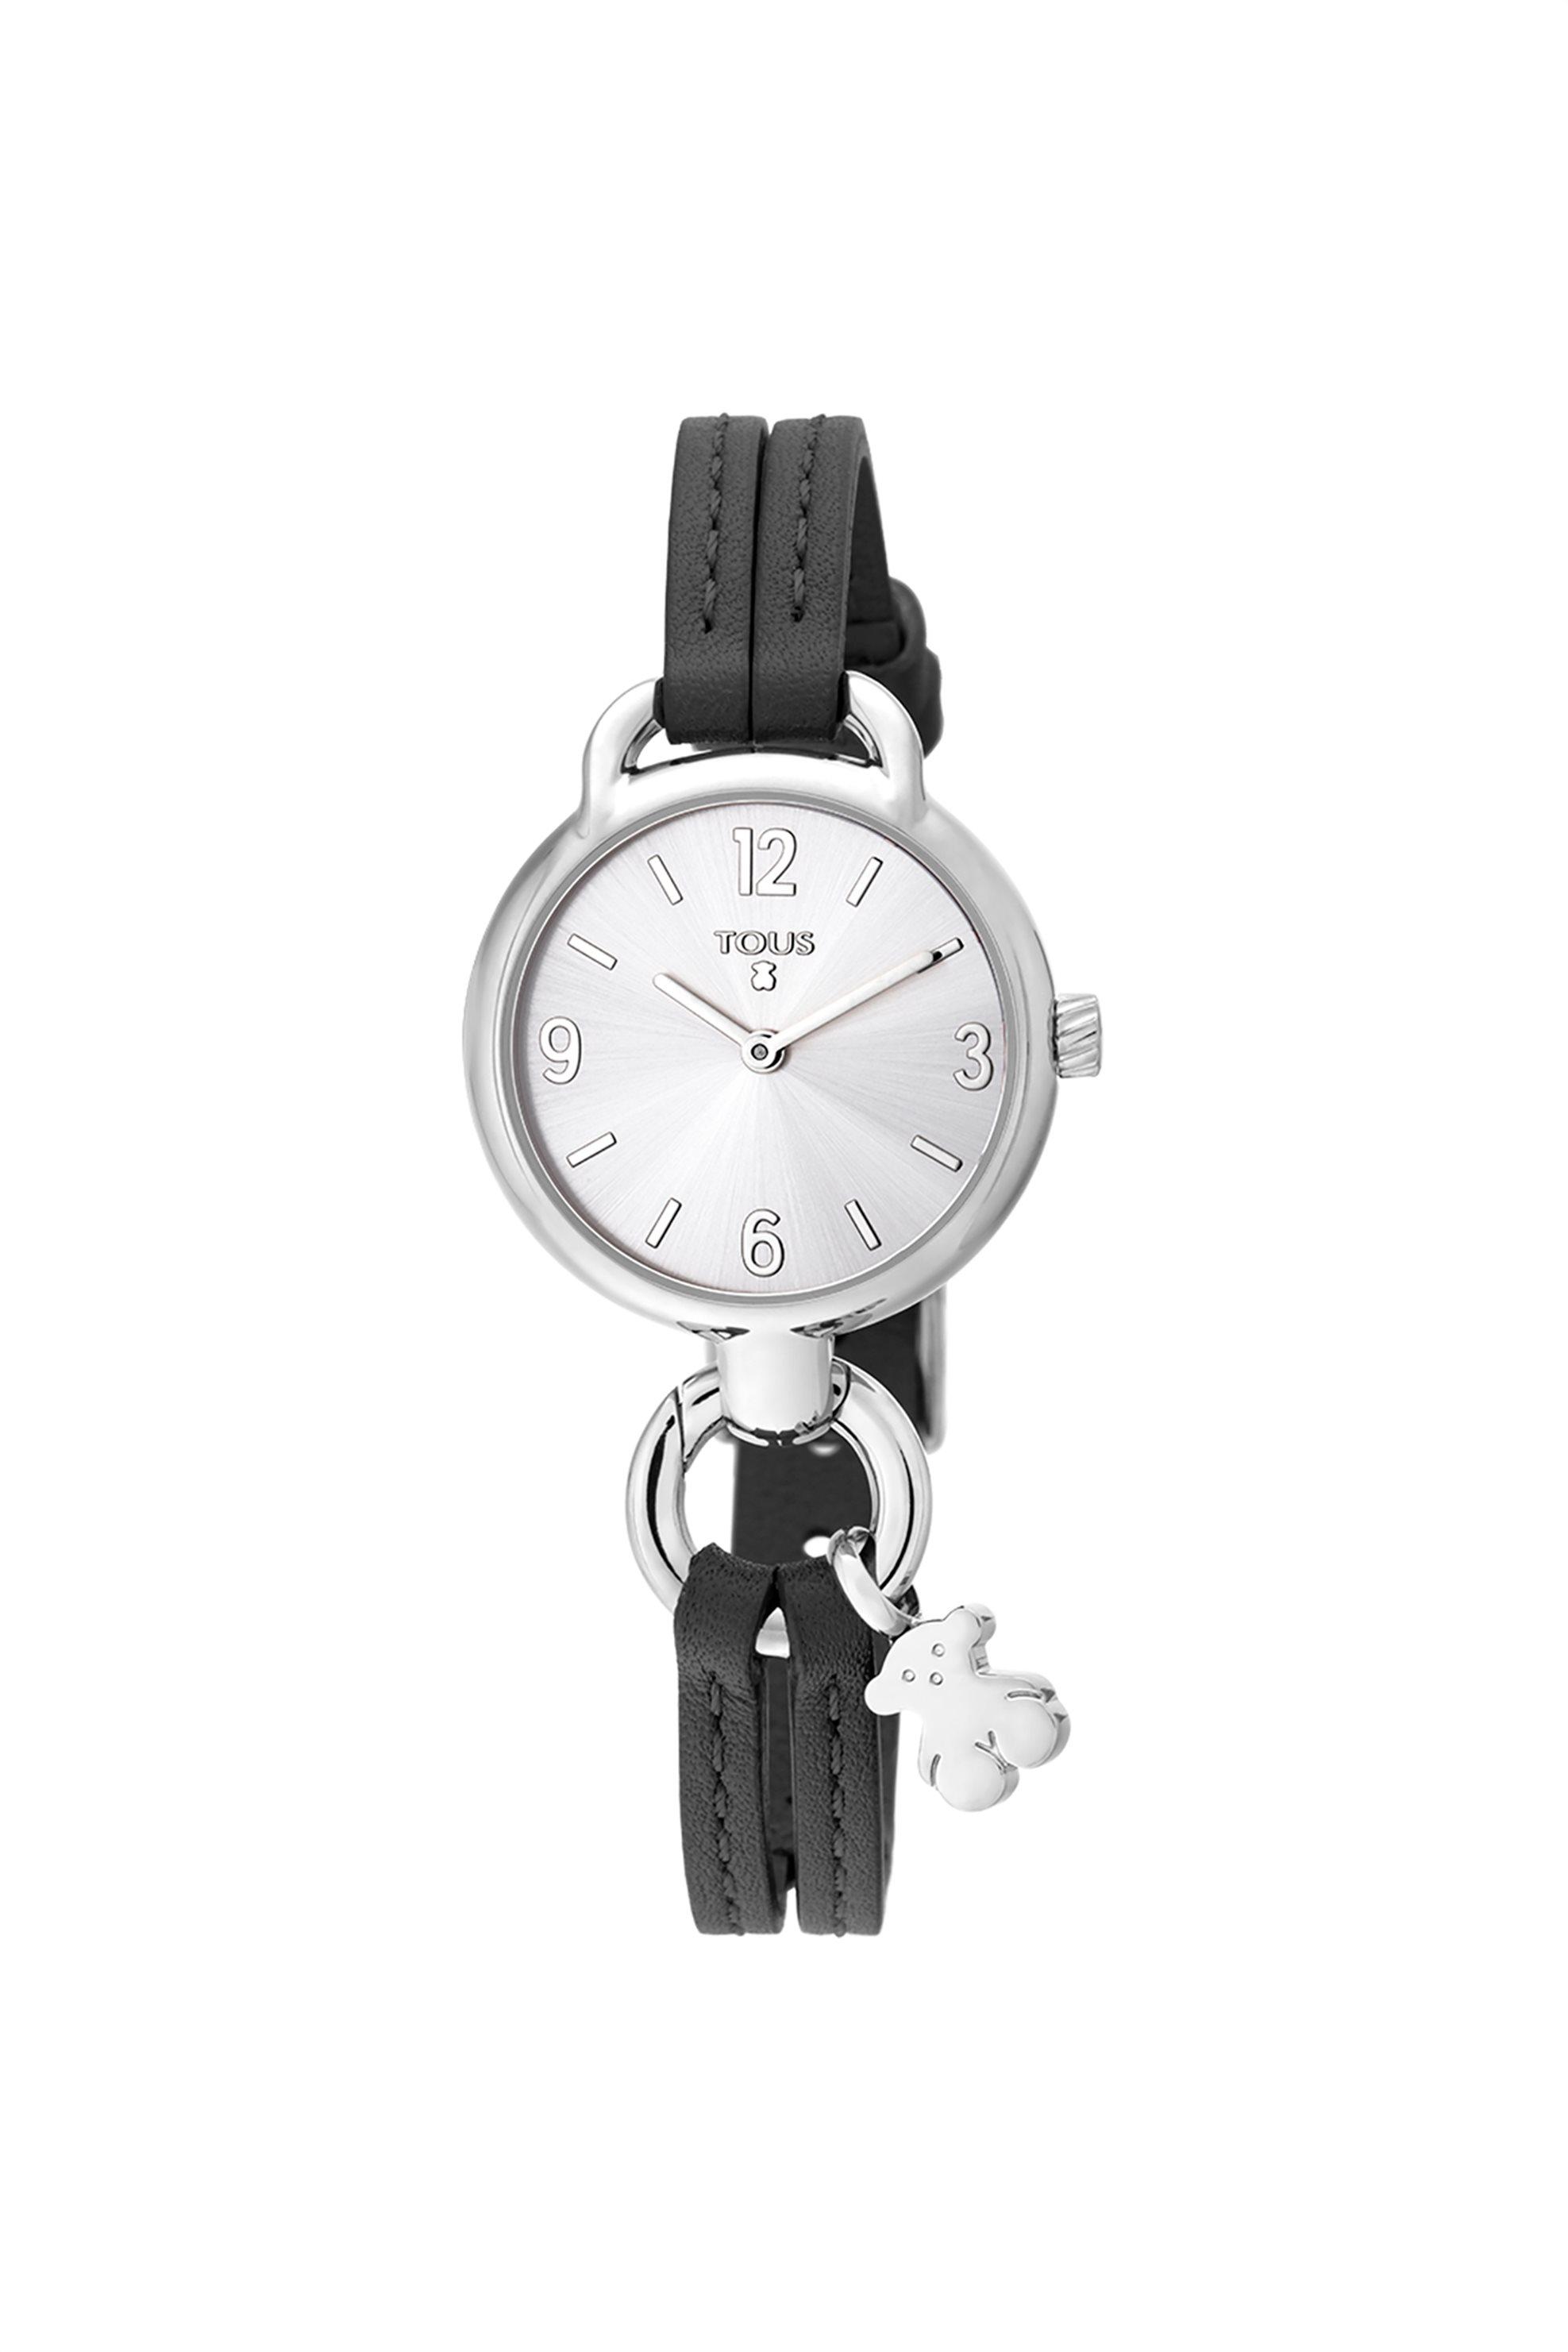 TOUS γυναικείο ρολόι Hold από Ατσάλι με μαύρο Δερμάτινο λουράκι - 3000089700 - Μαύρο